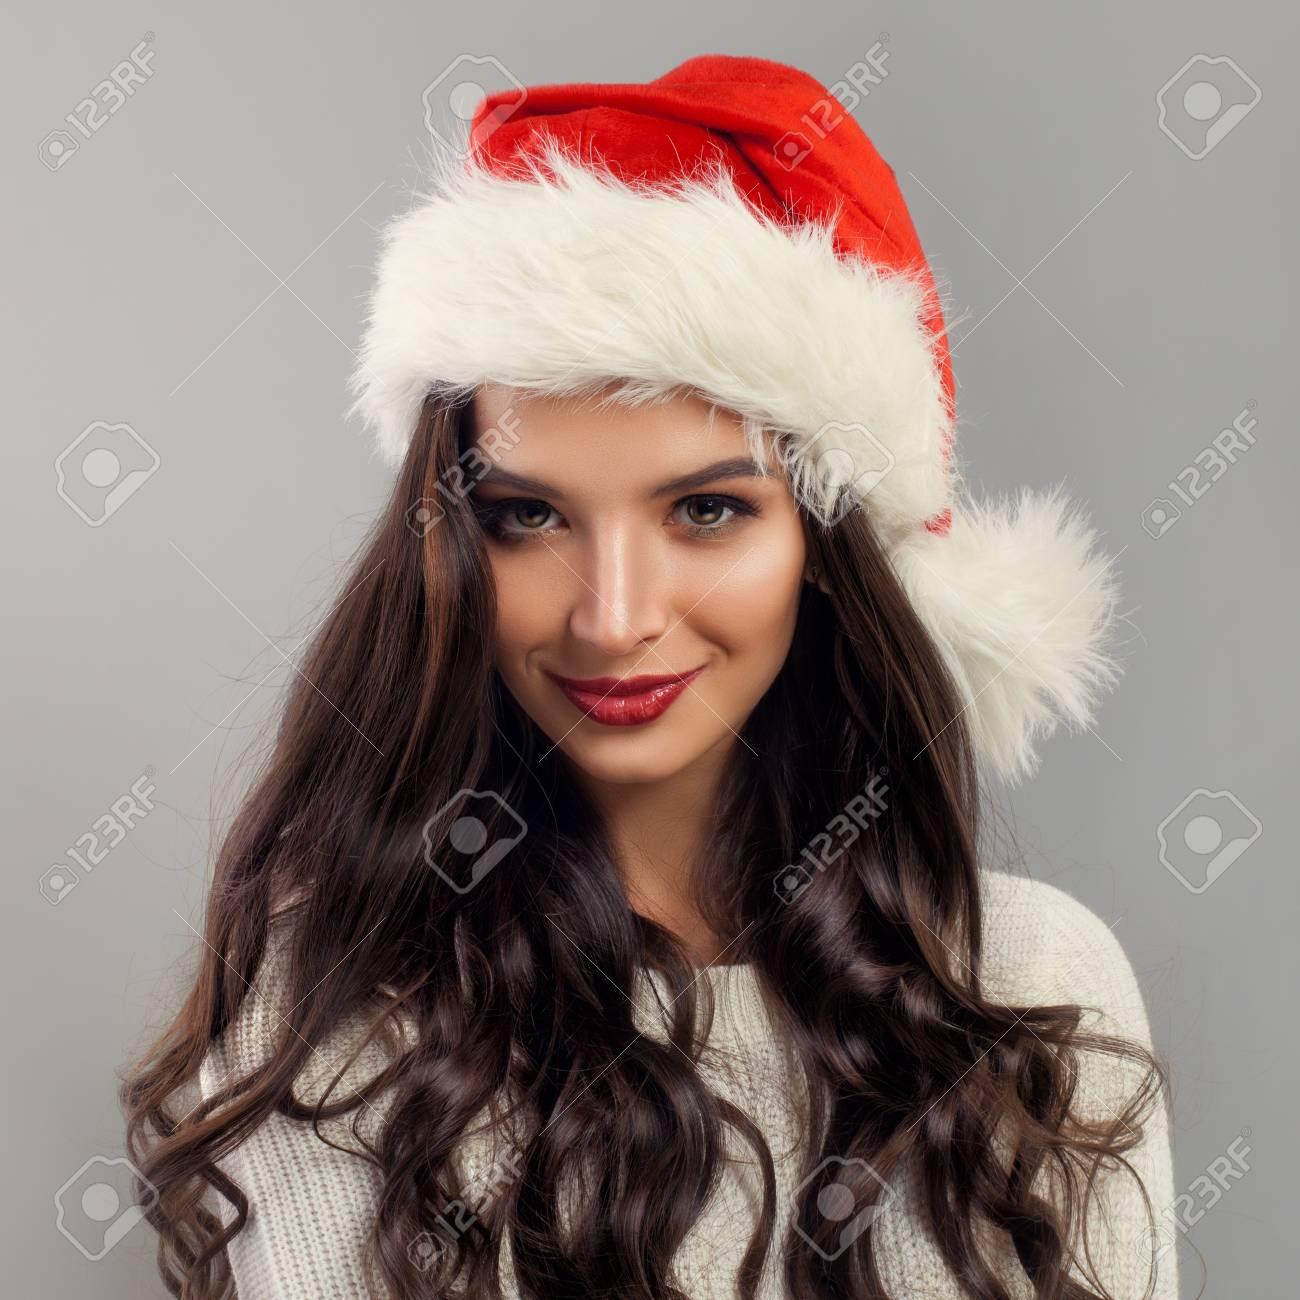 Christmas Model Woman wearing Santa Claus Hat, Beauty Fashion..